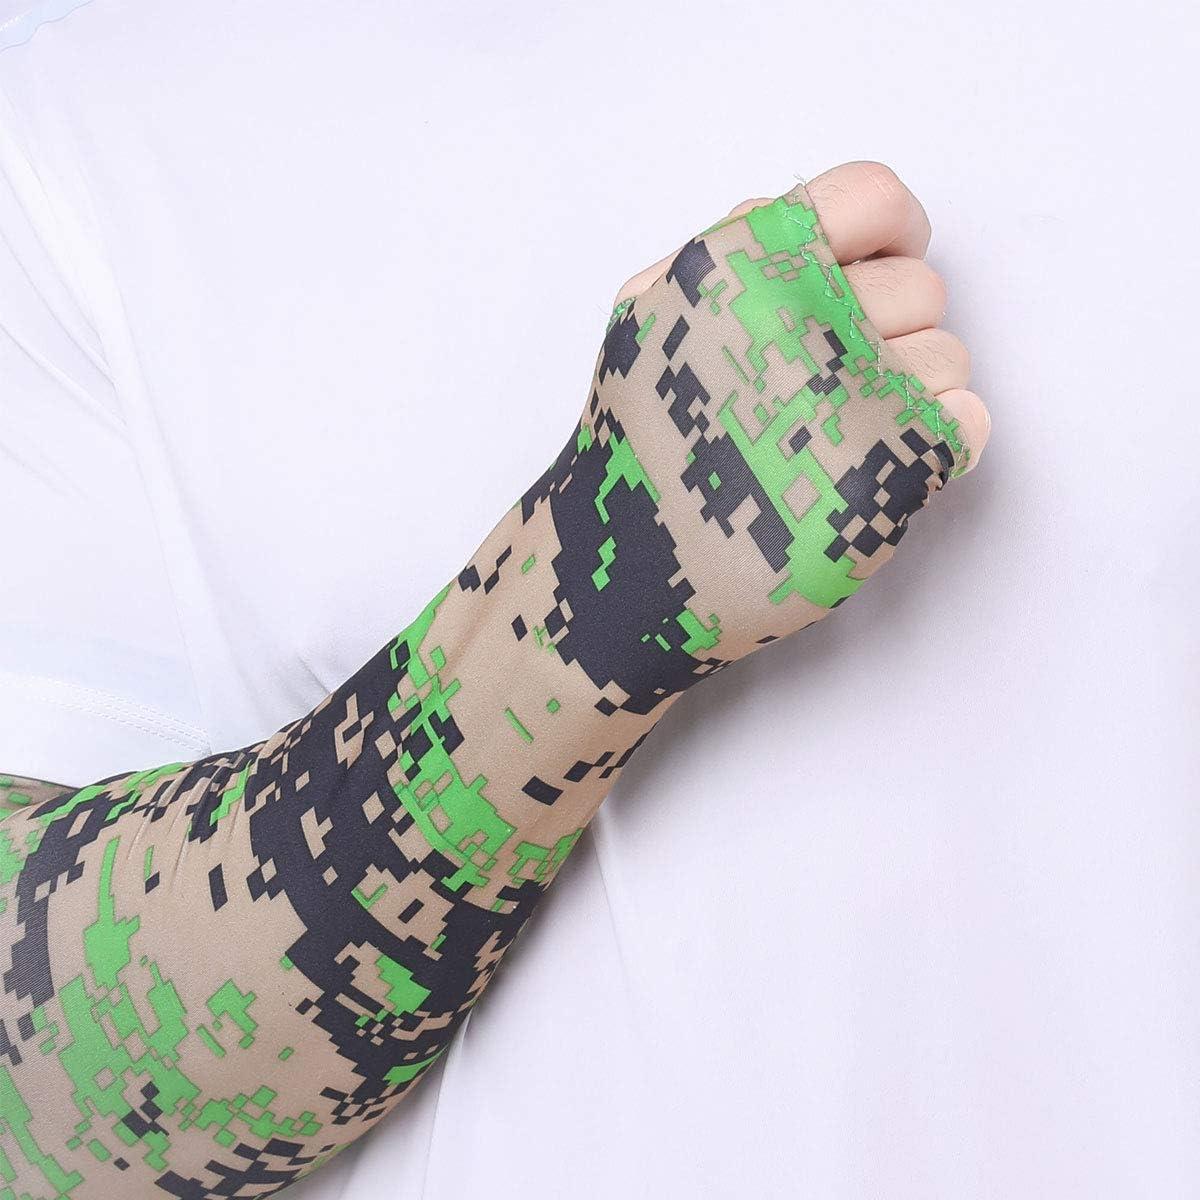 Naviurway Face Scarf Arm Sleeves Cover Bandana Neck Gaiter Balaclava Headbands Camouflage Green